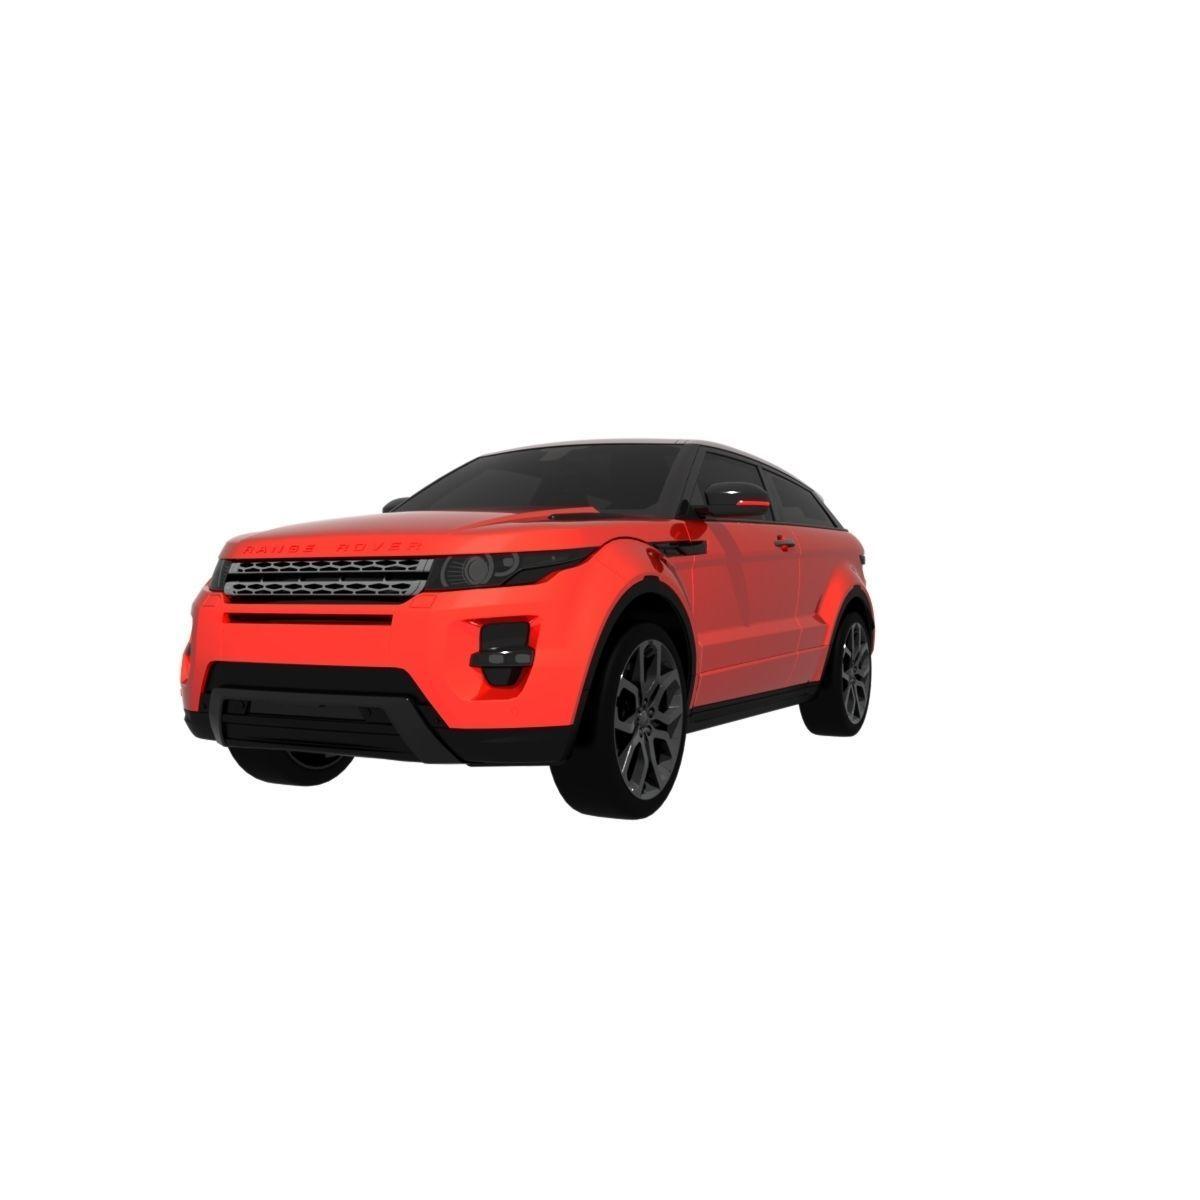 Range Rover Evoque with PBR textures